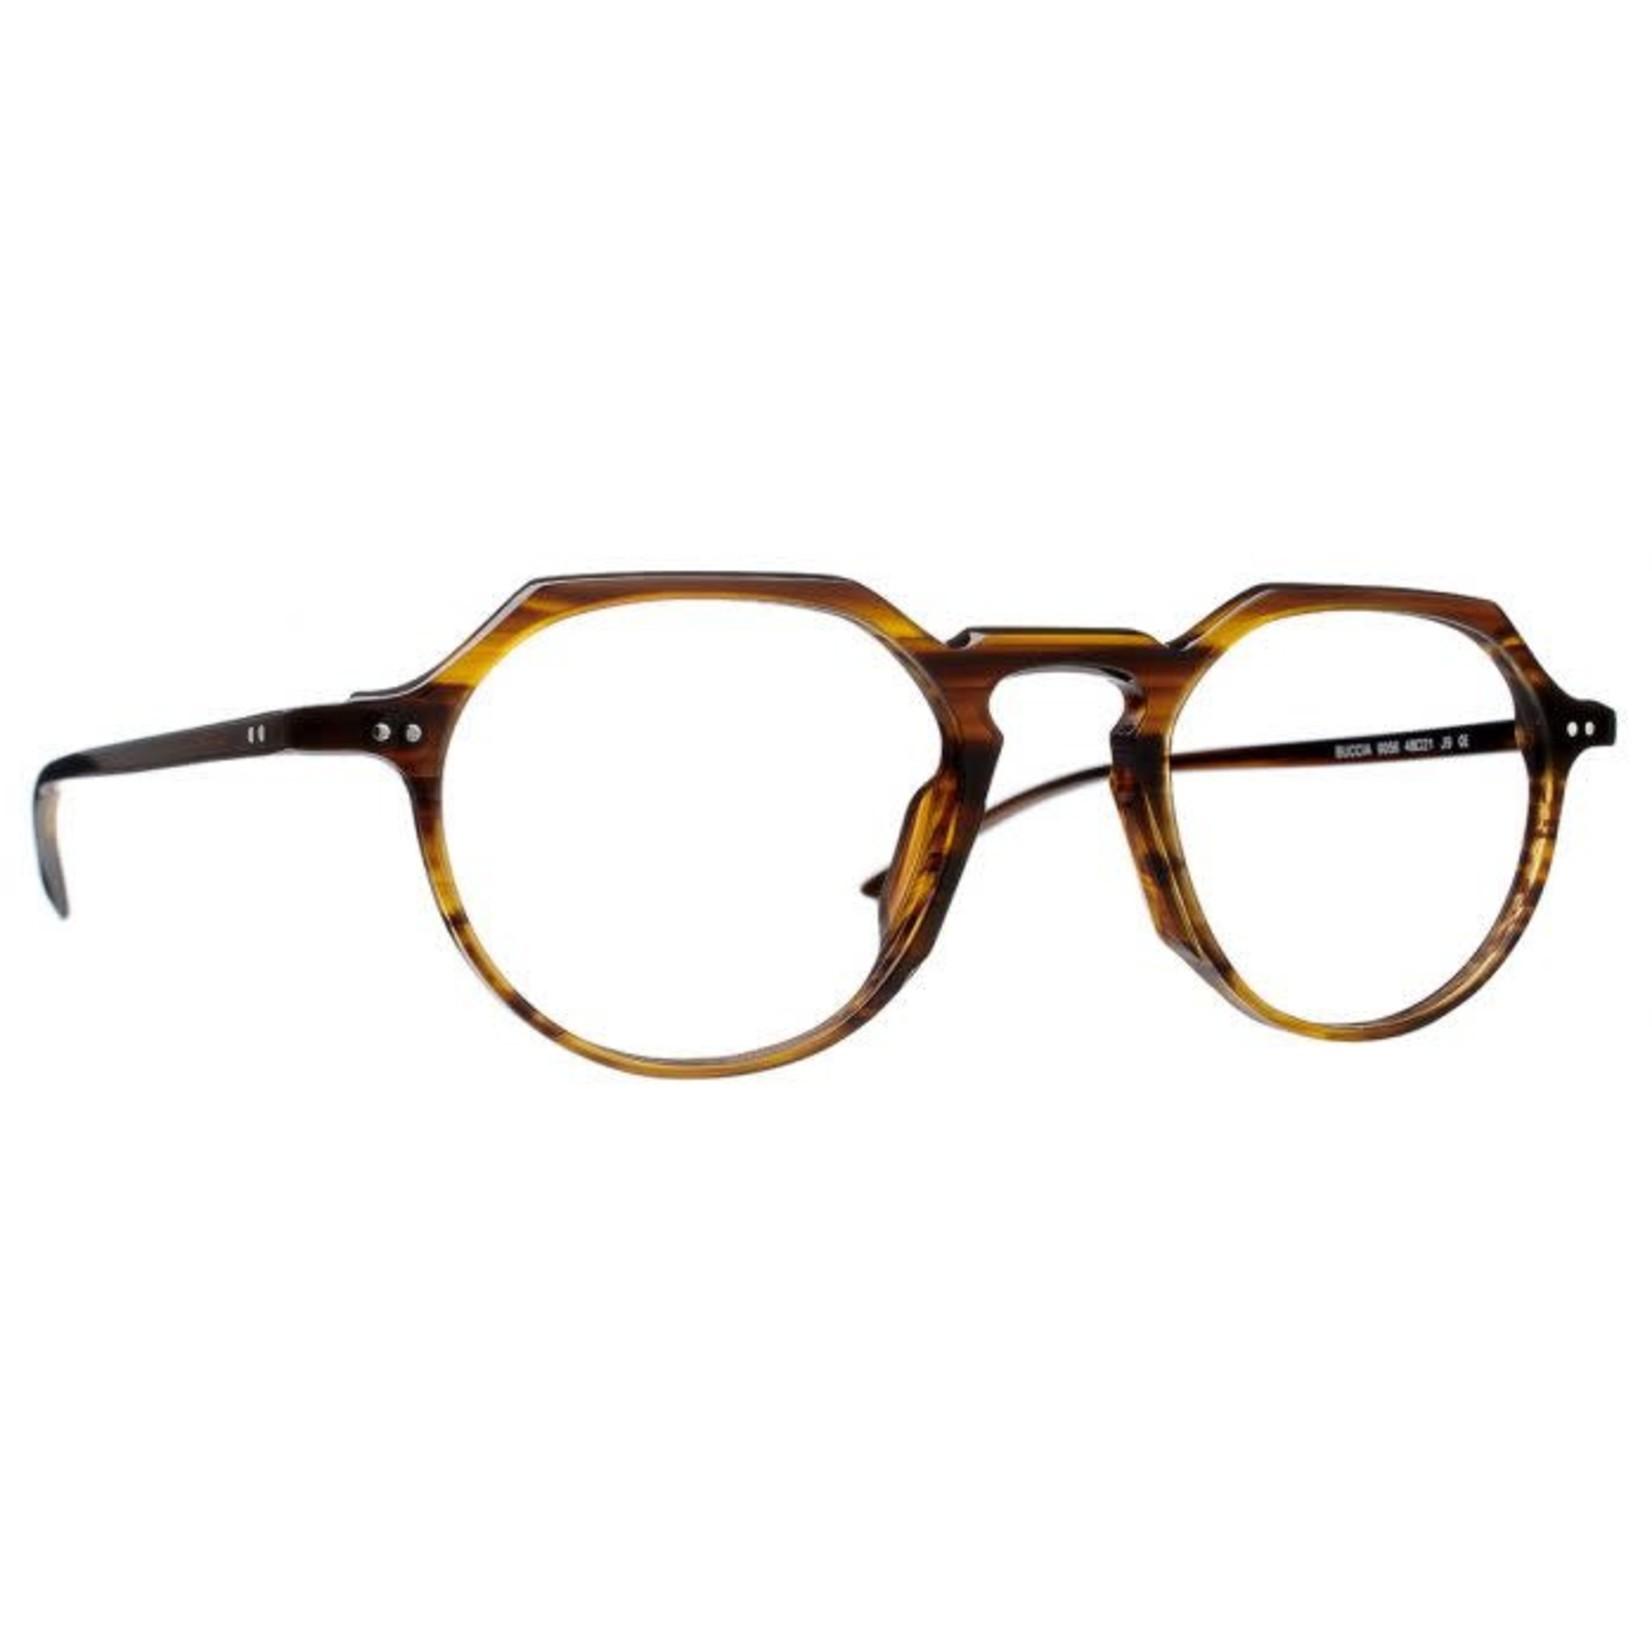 Talla Eyewear Talla Buccia